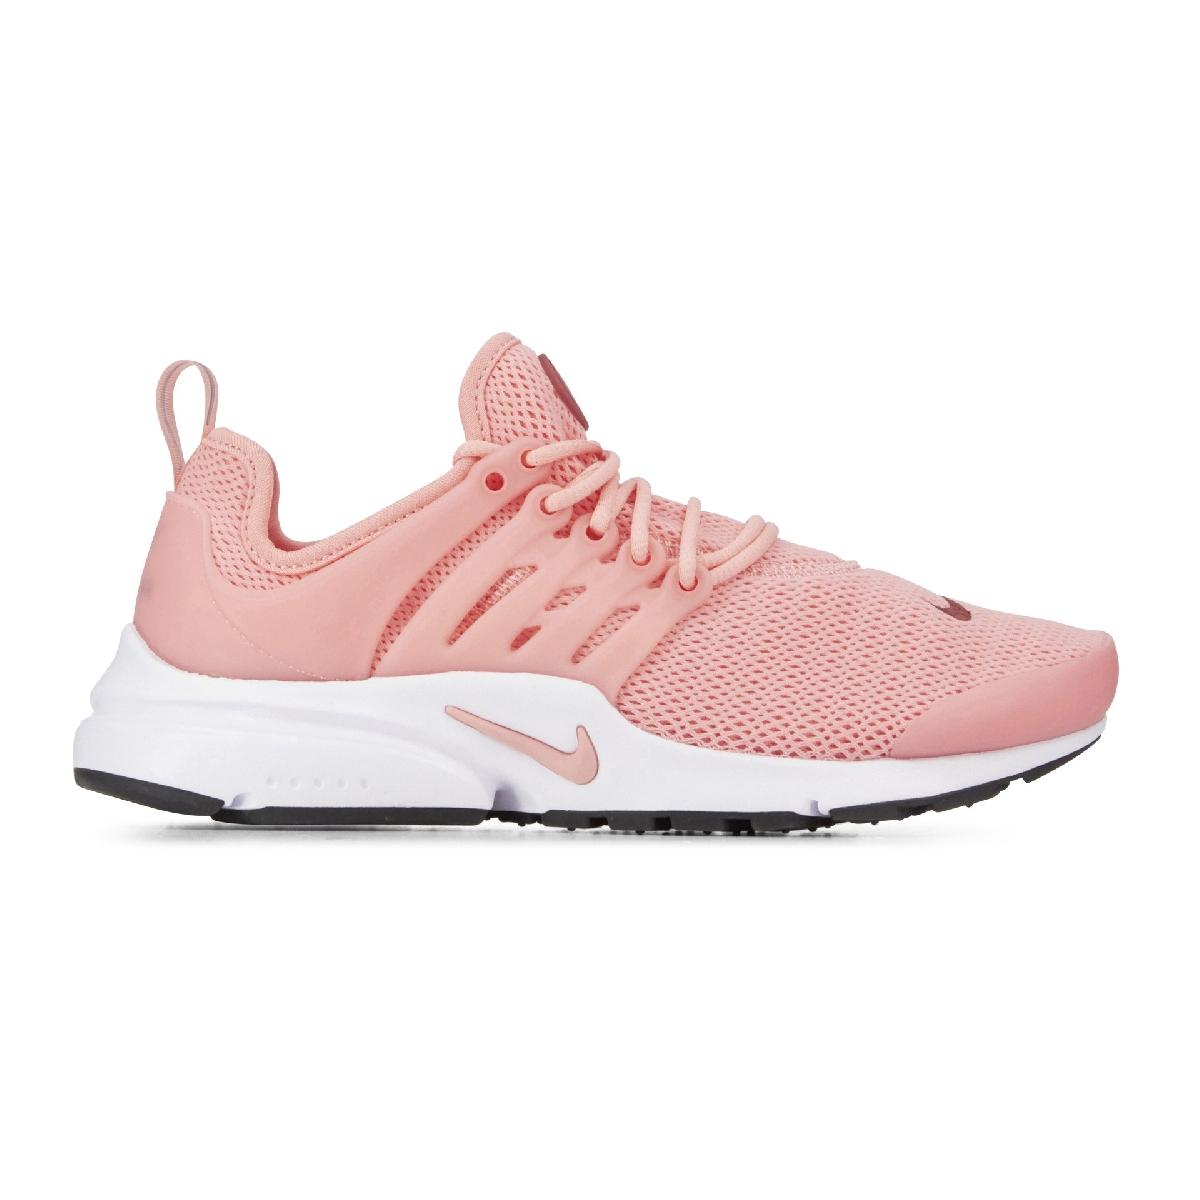 competitive price d7732 0fe9e ... buy nouvelle version nike air presto rose et blanche femme solde  sb203847 boutique. femmes rose